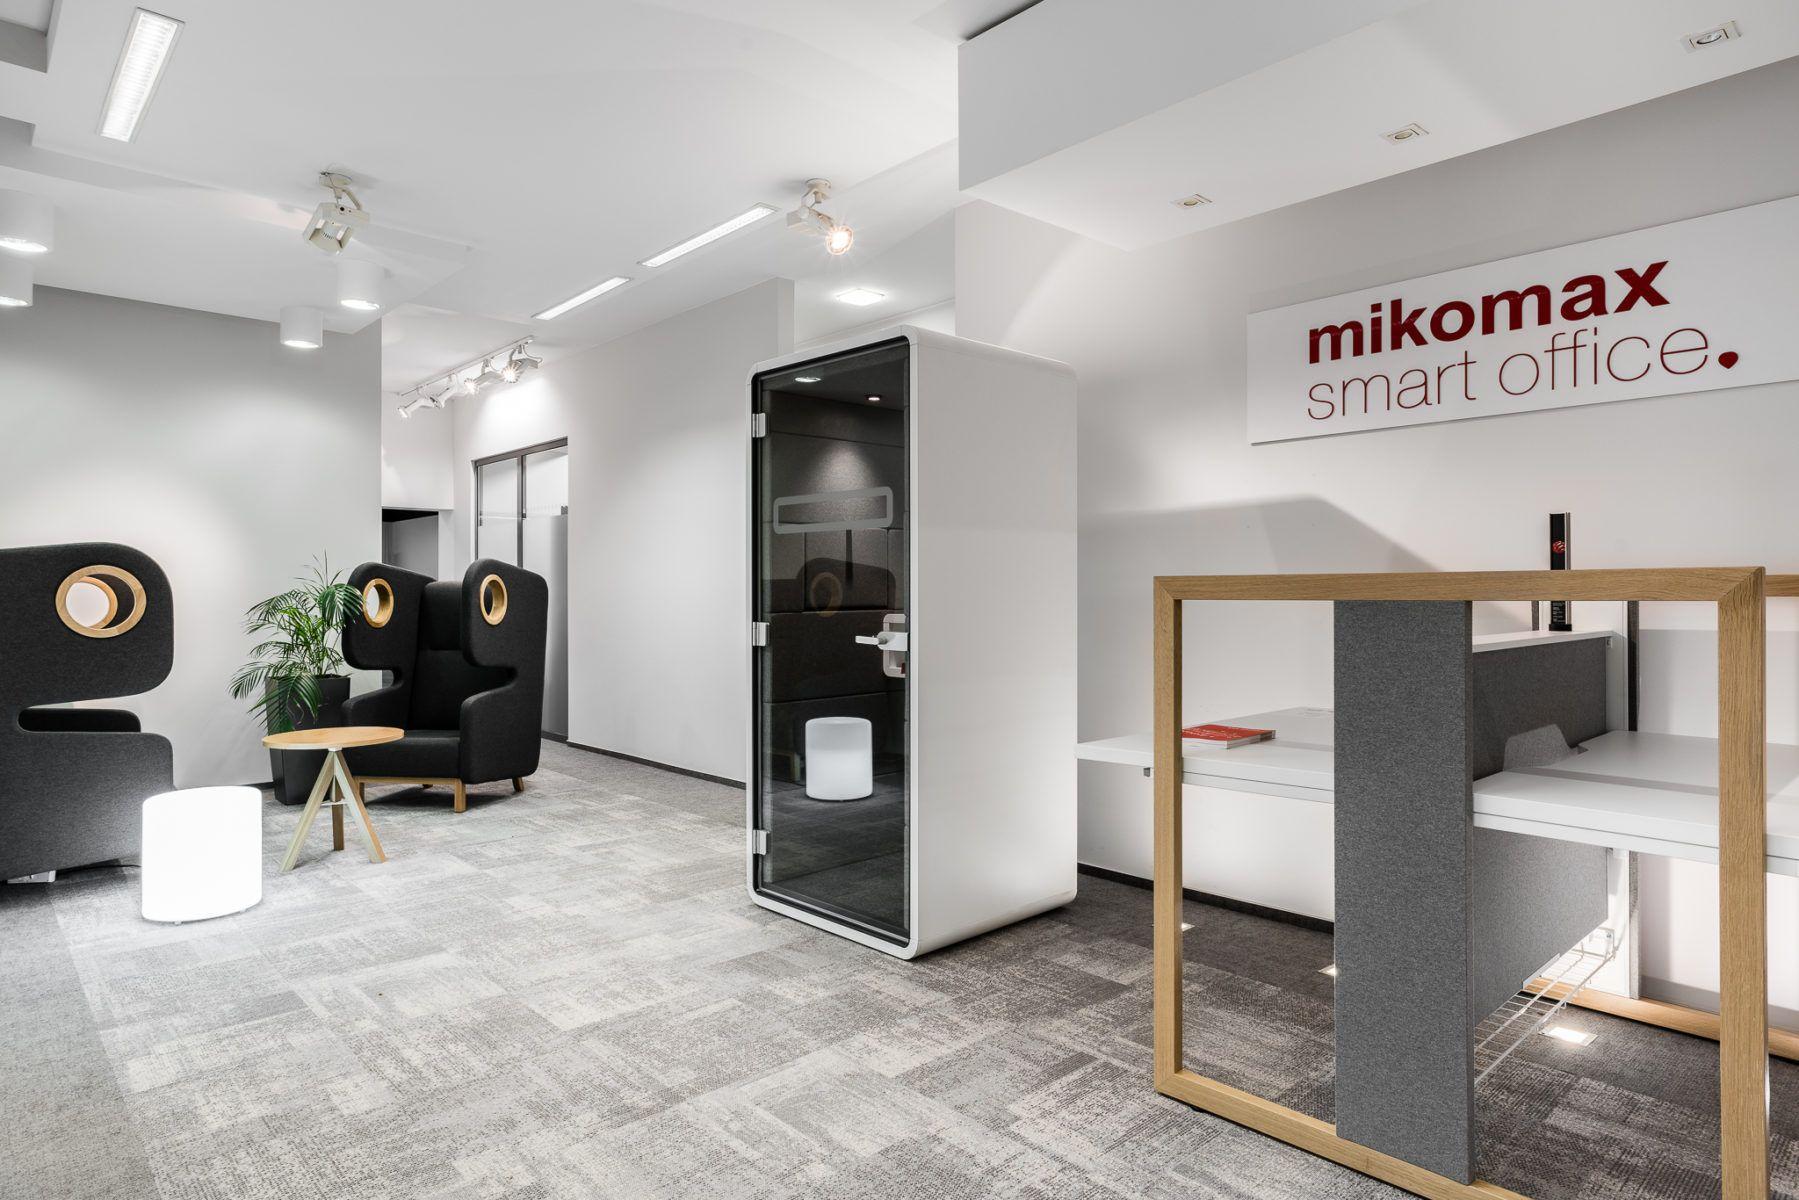 HUSH PHONE Mikomax Smart Office Smart home, House